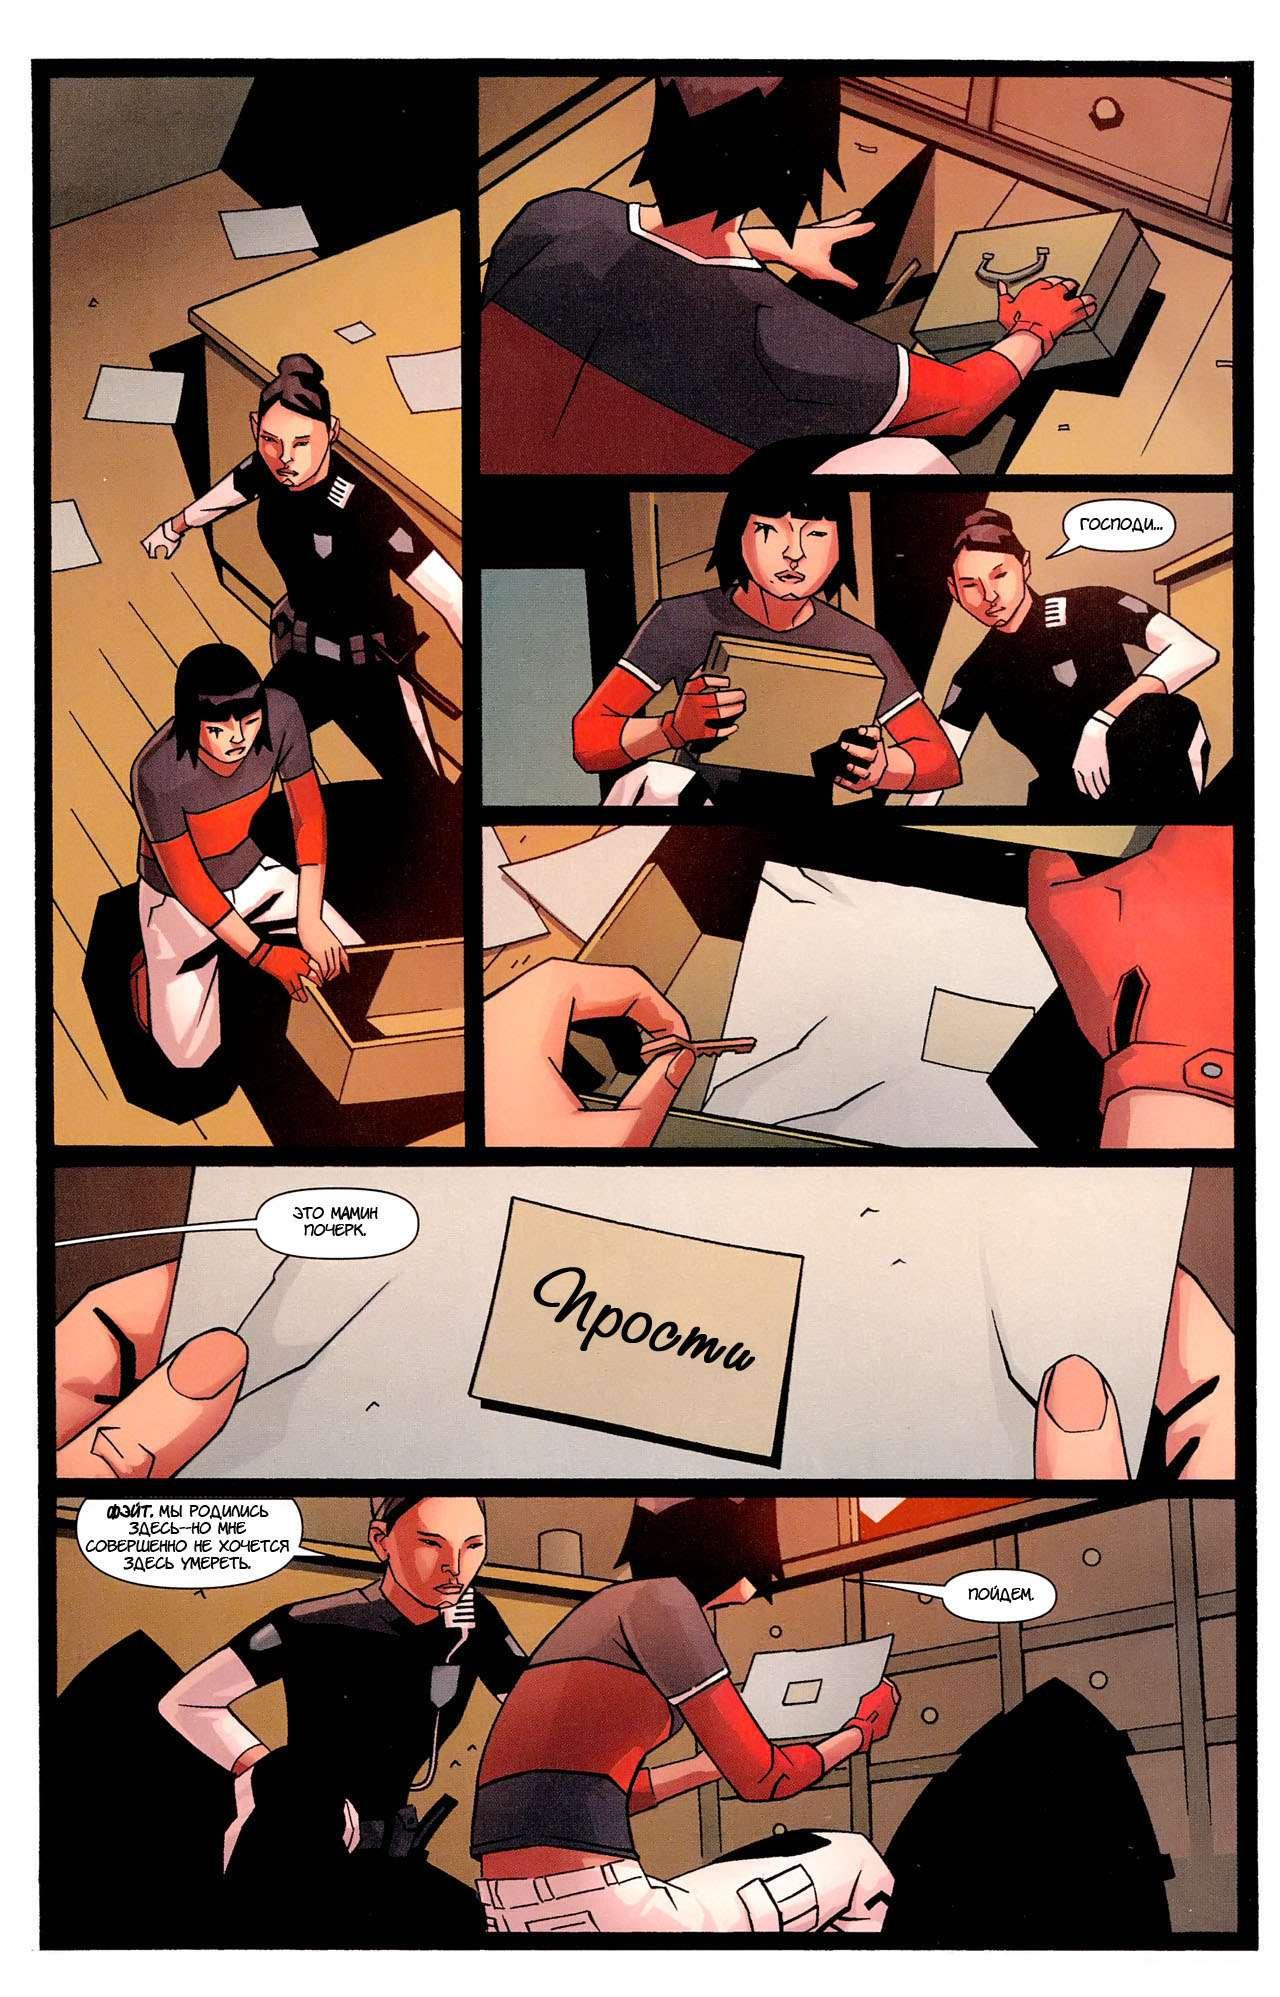 mirrors-edge-05-pg-32